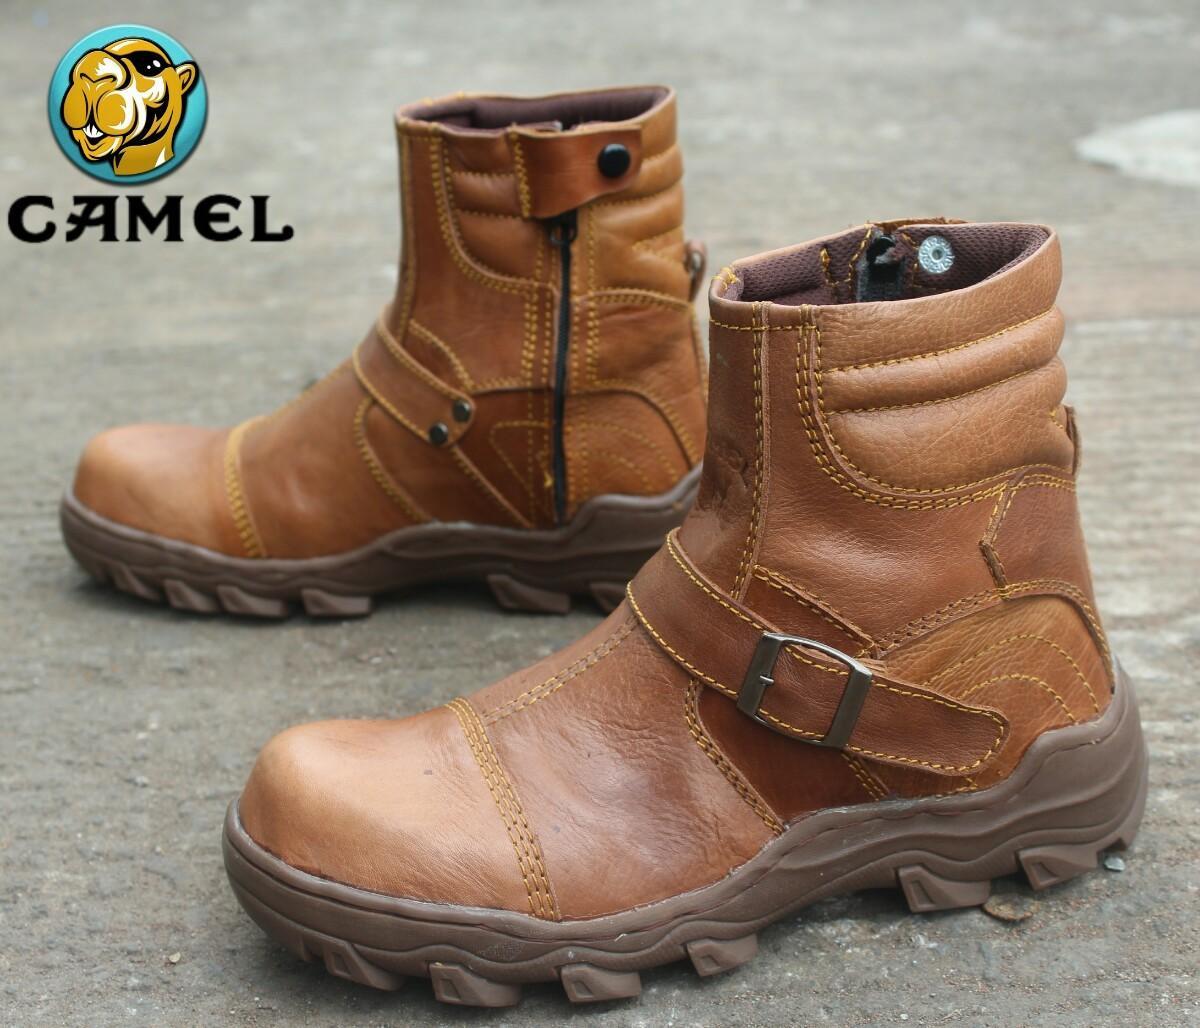 Sepatu Camel Daftar Harga Desember 2018 Headway Grow Brown Semi Boots Pria Original Cloathing Predator Tan Leather Safety Sz 39 43